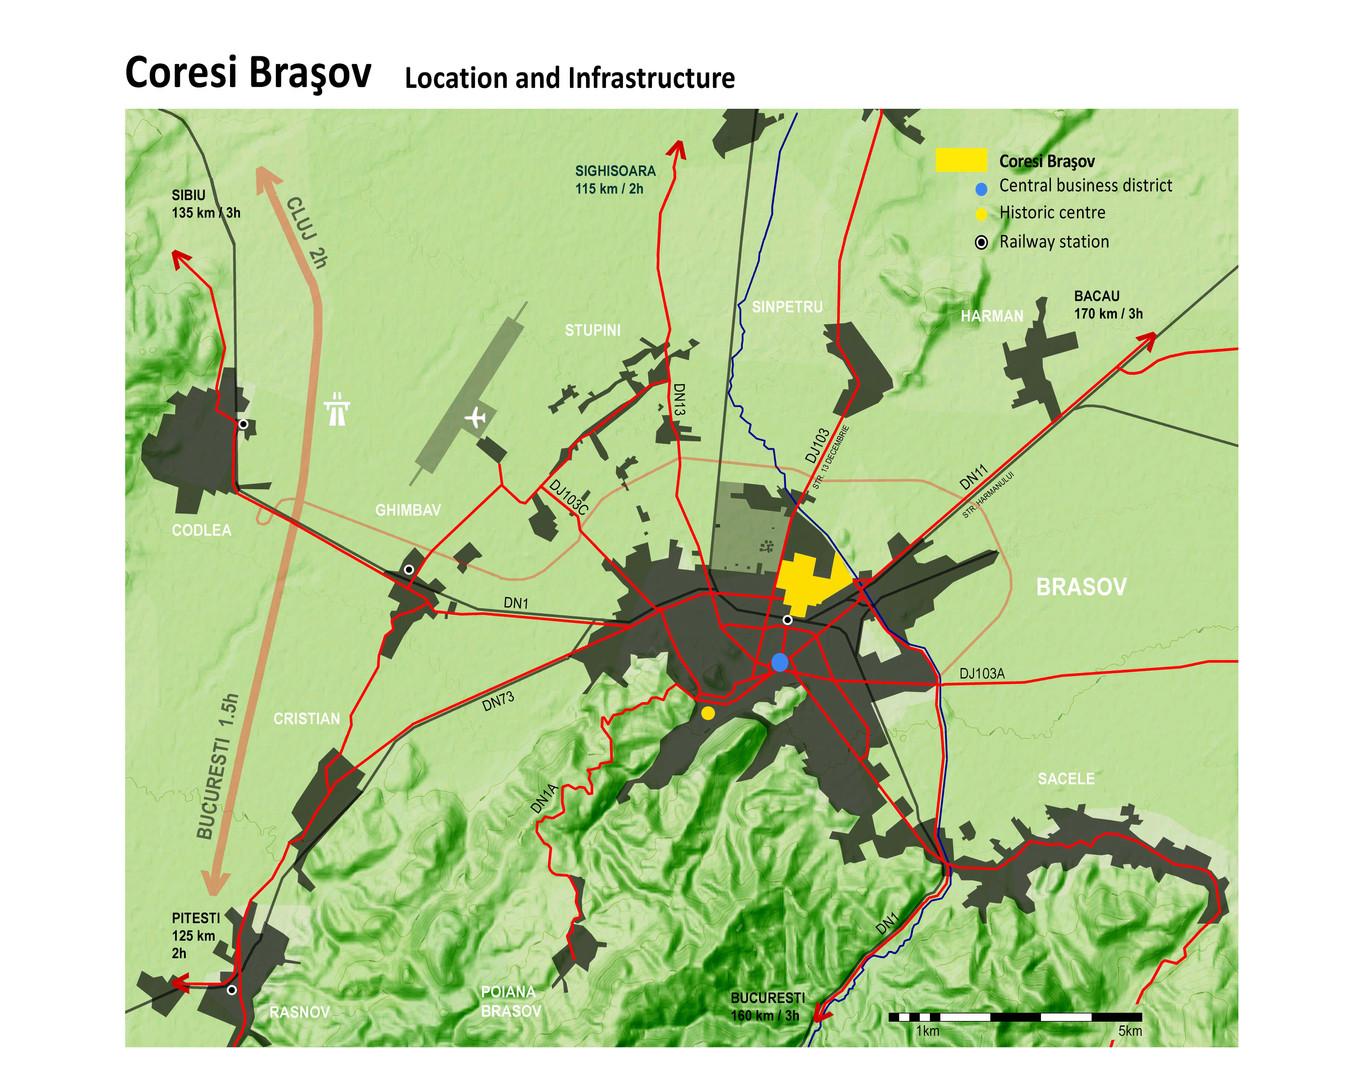 Site Location in Brasov